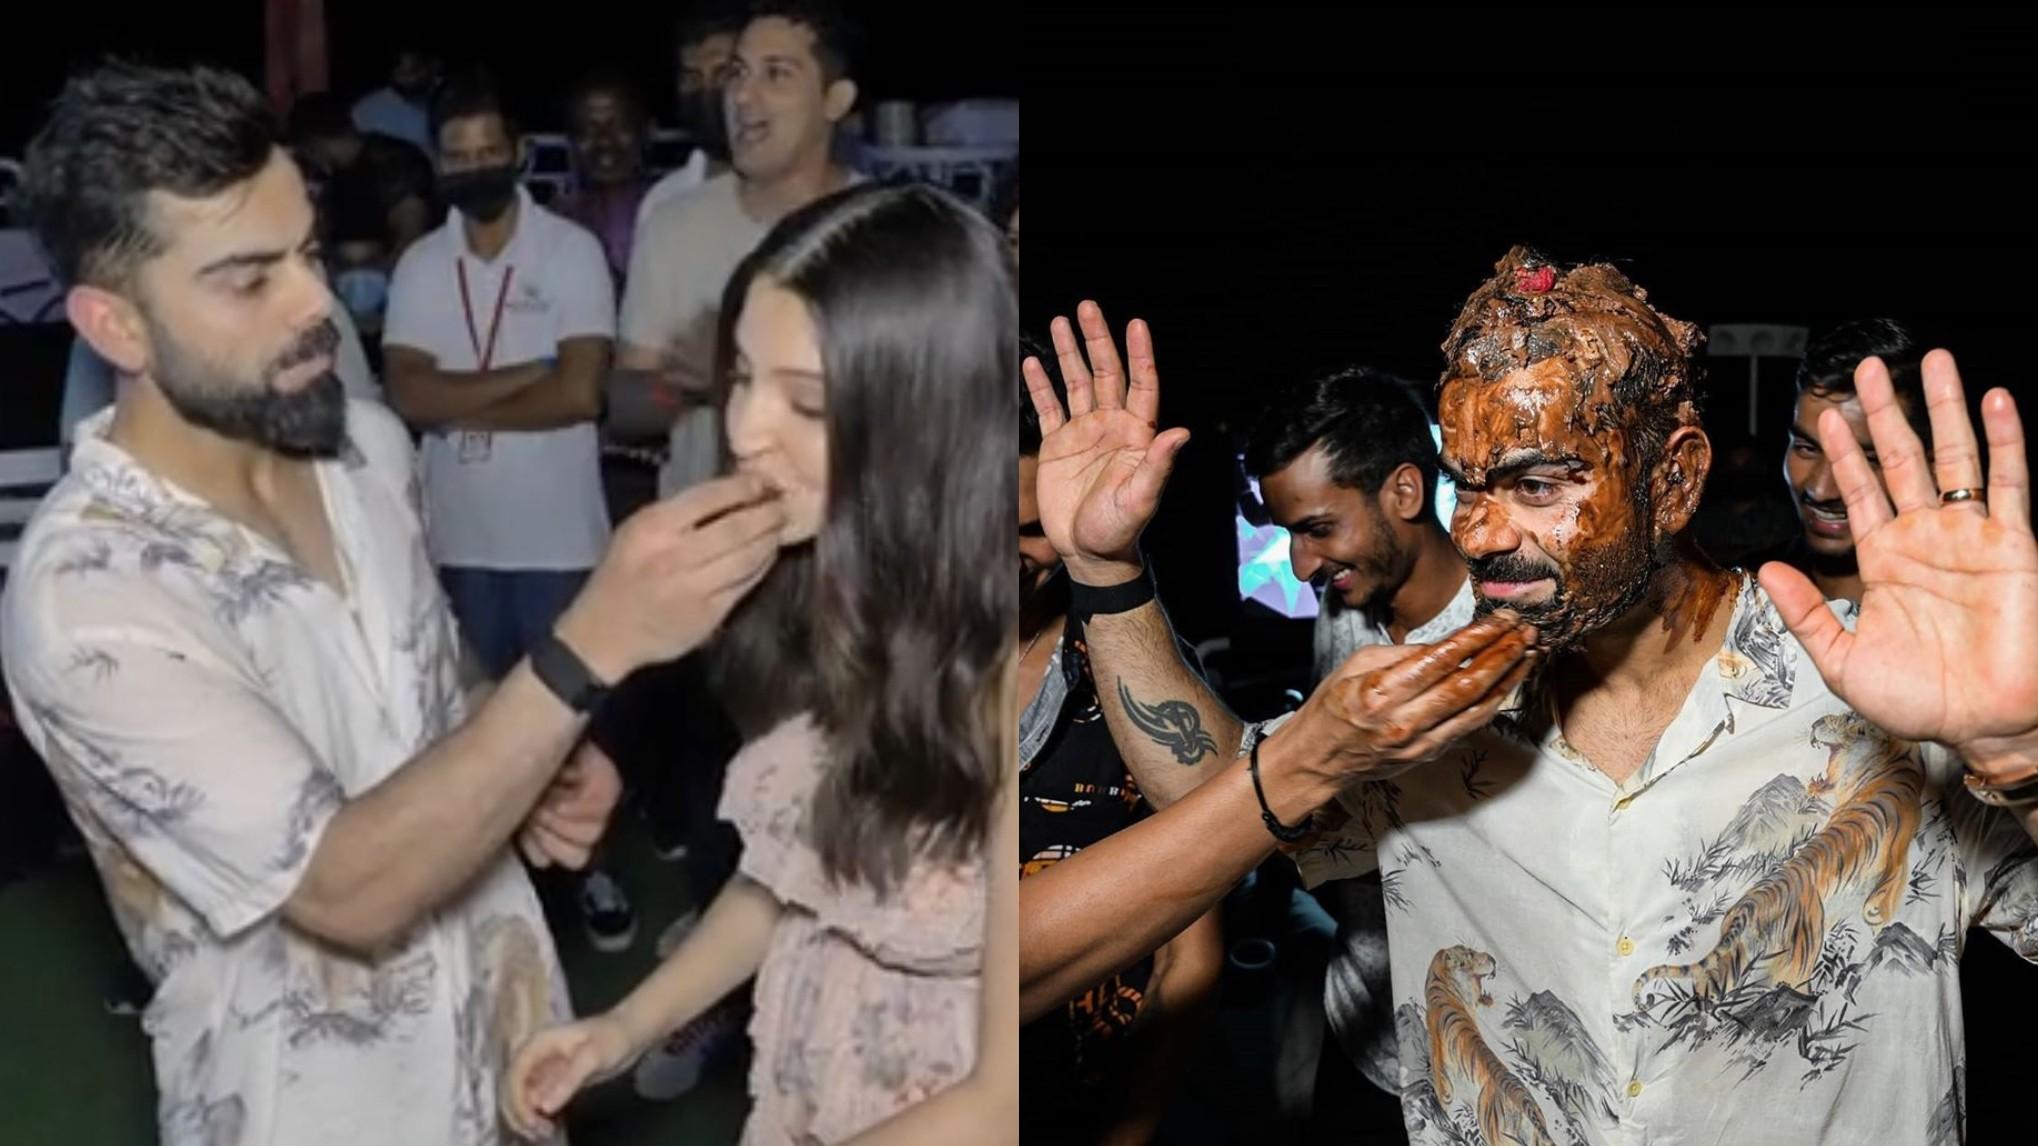 IPL 2020: WATCH- RCB players wish Virat Kohli on his birthday and smear him with cake afterwards